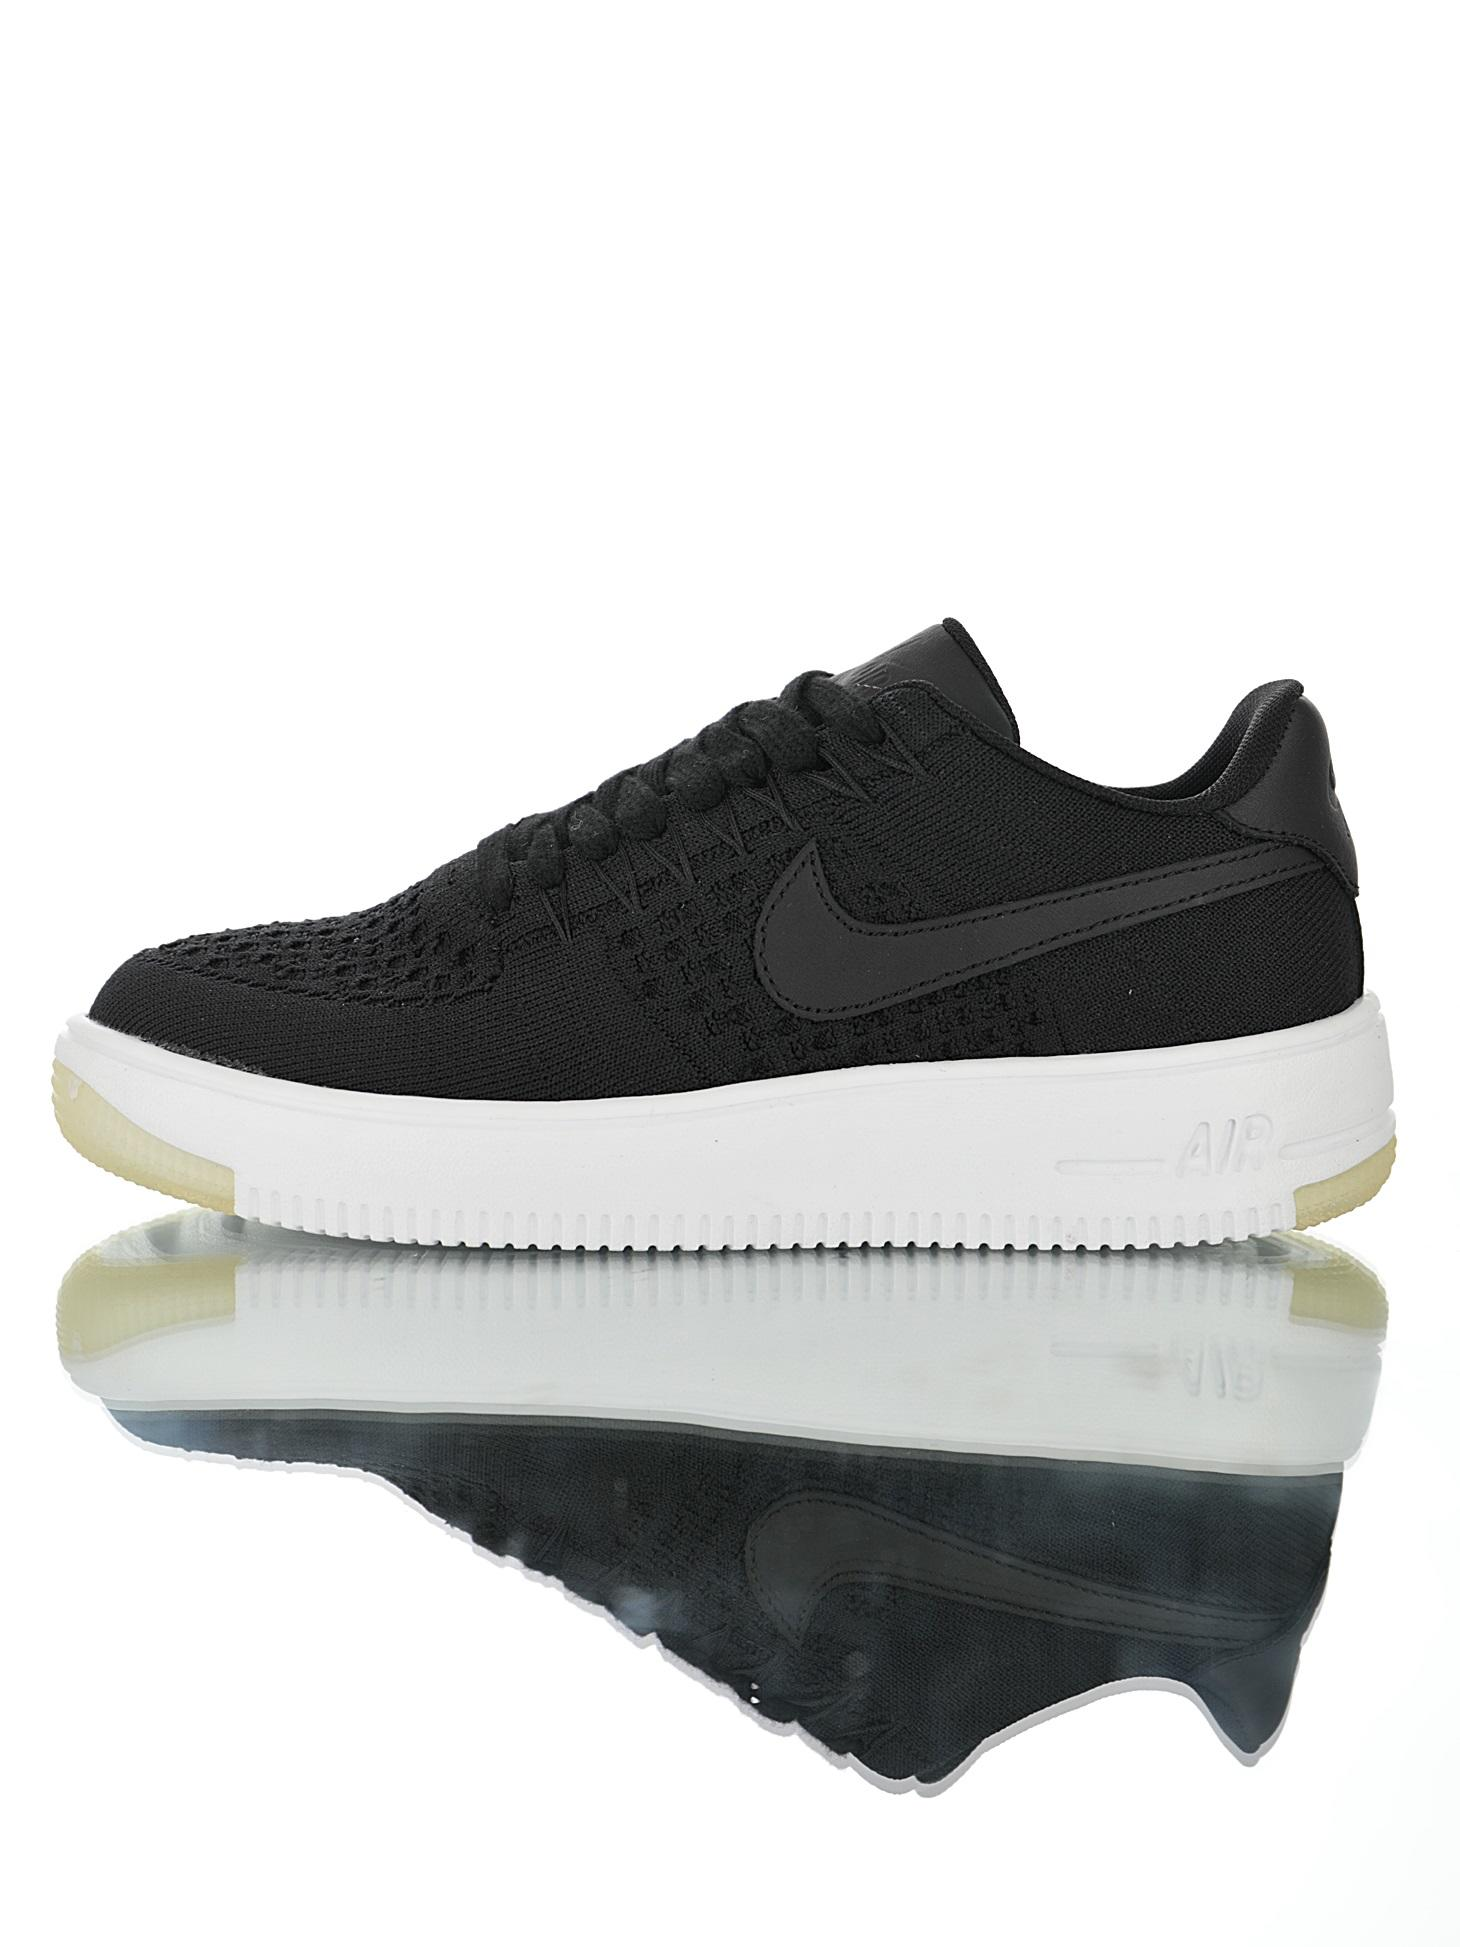 "Nike Air Force 1 Flyknit""Black White""2.0"